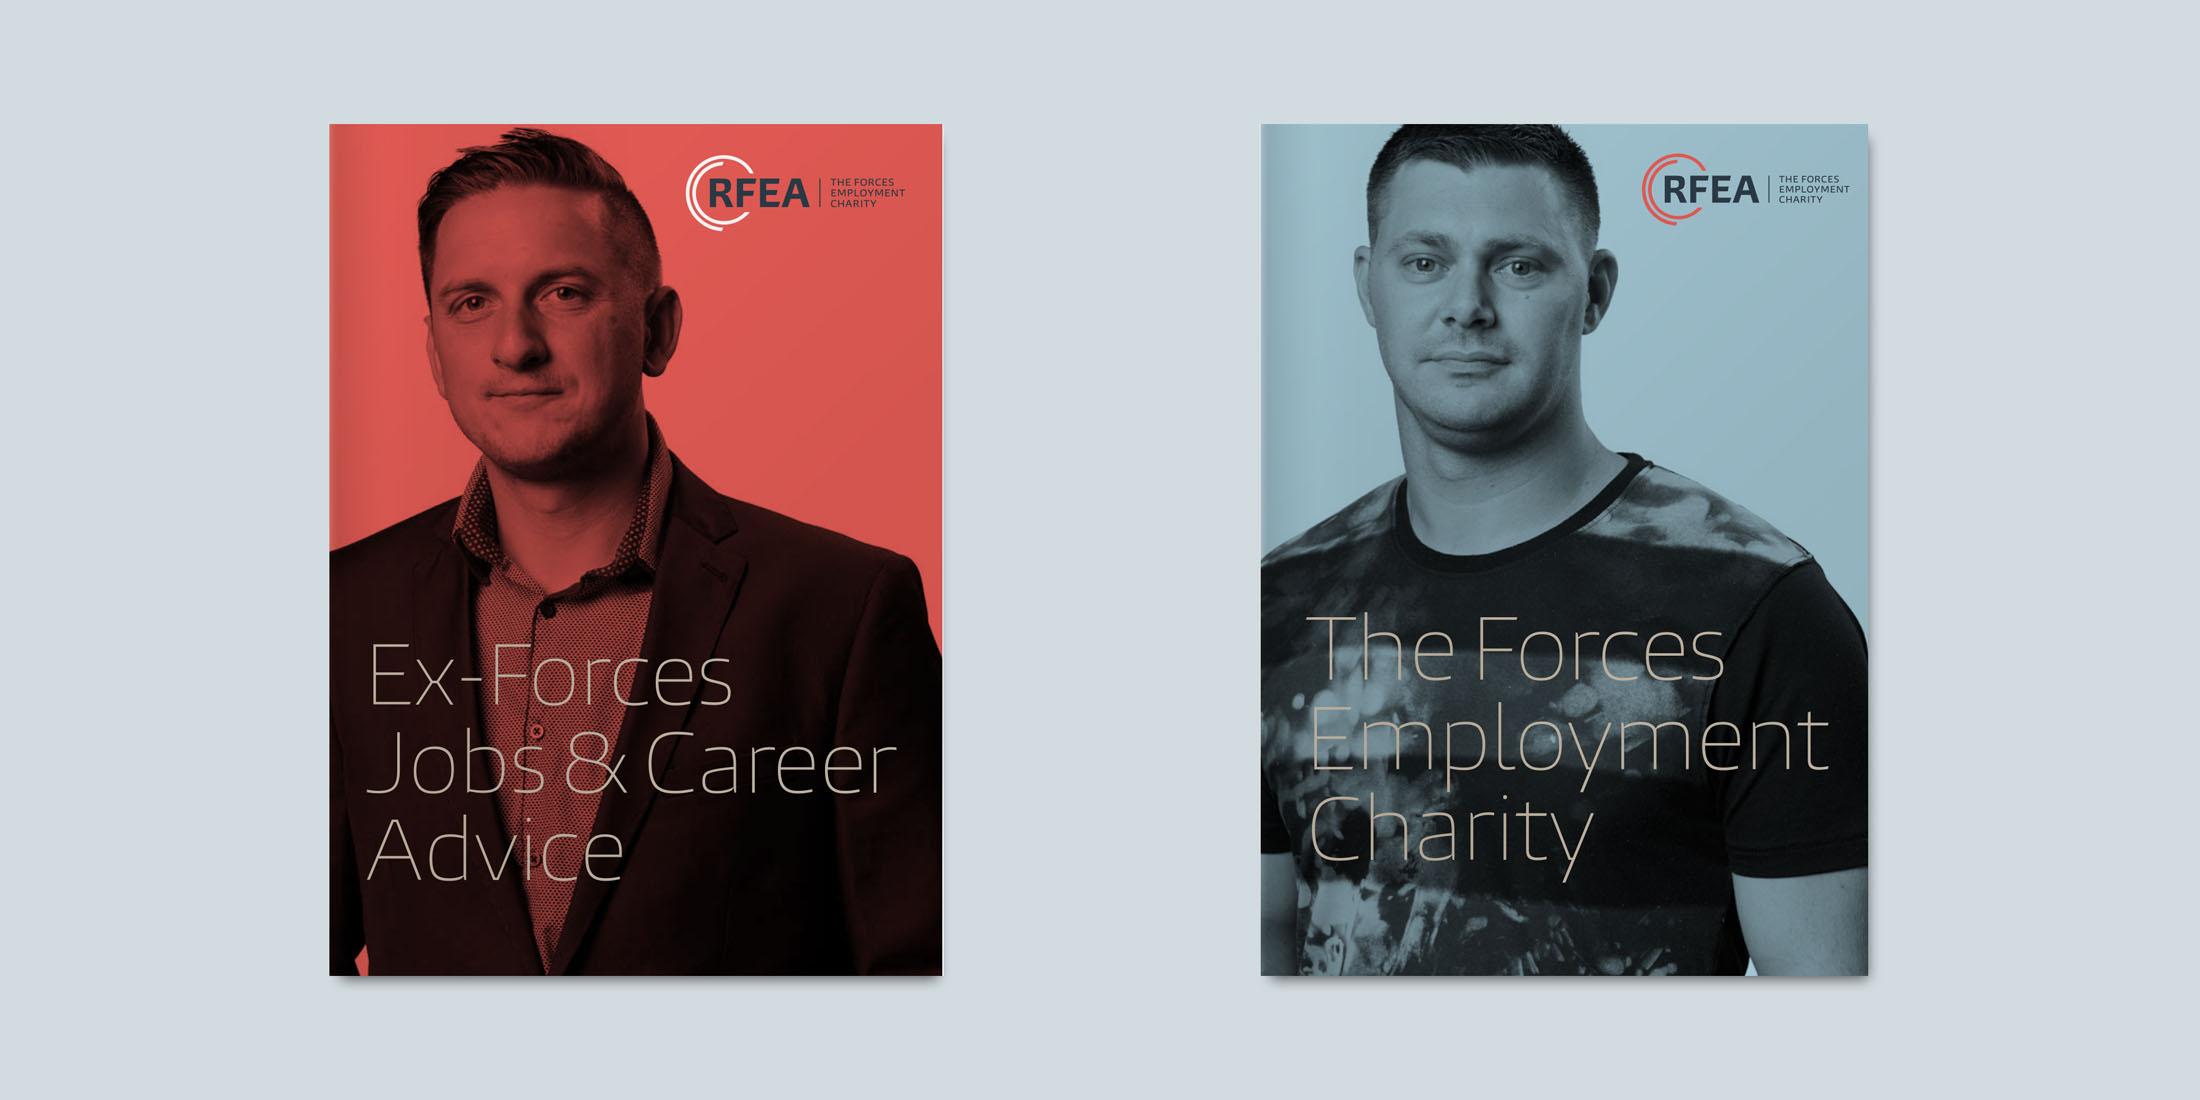 RFEA covers